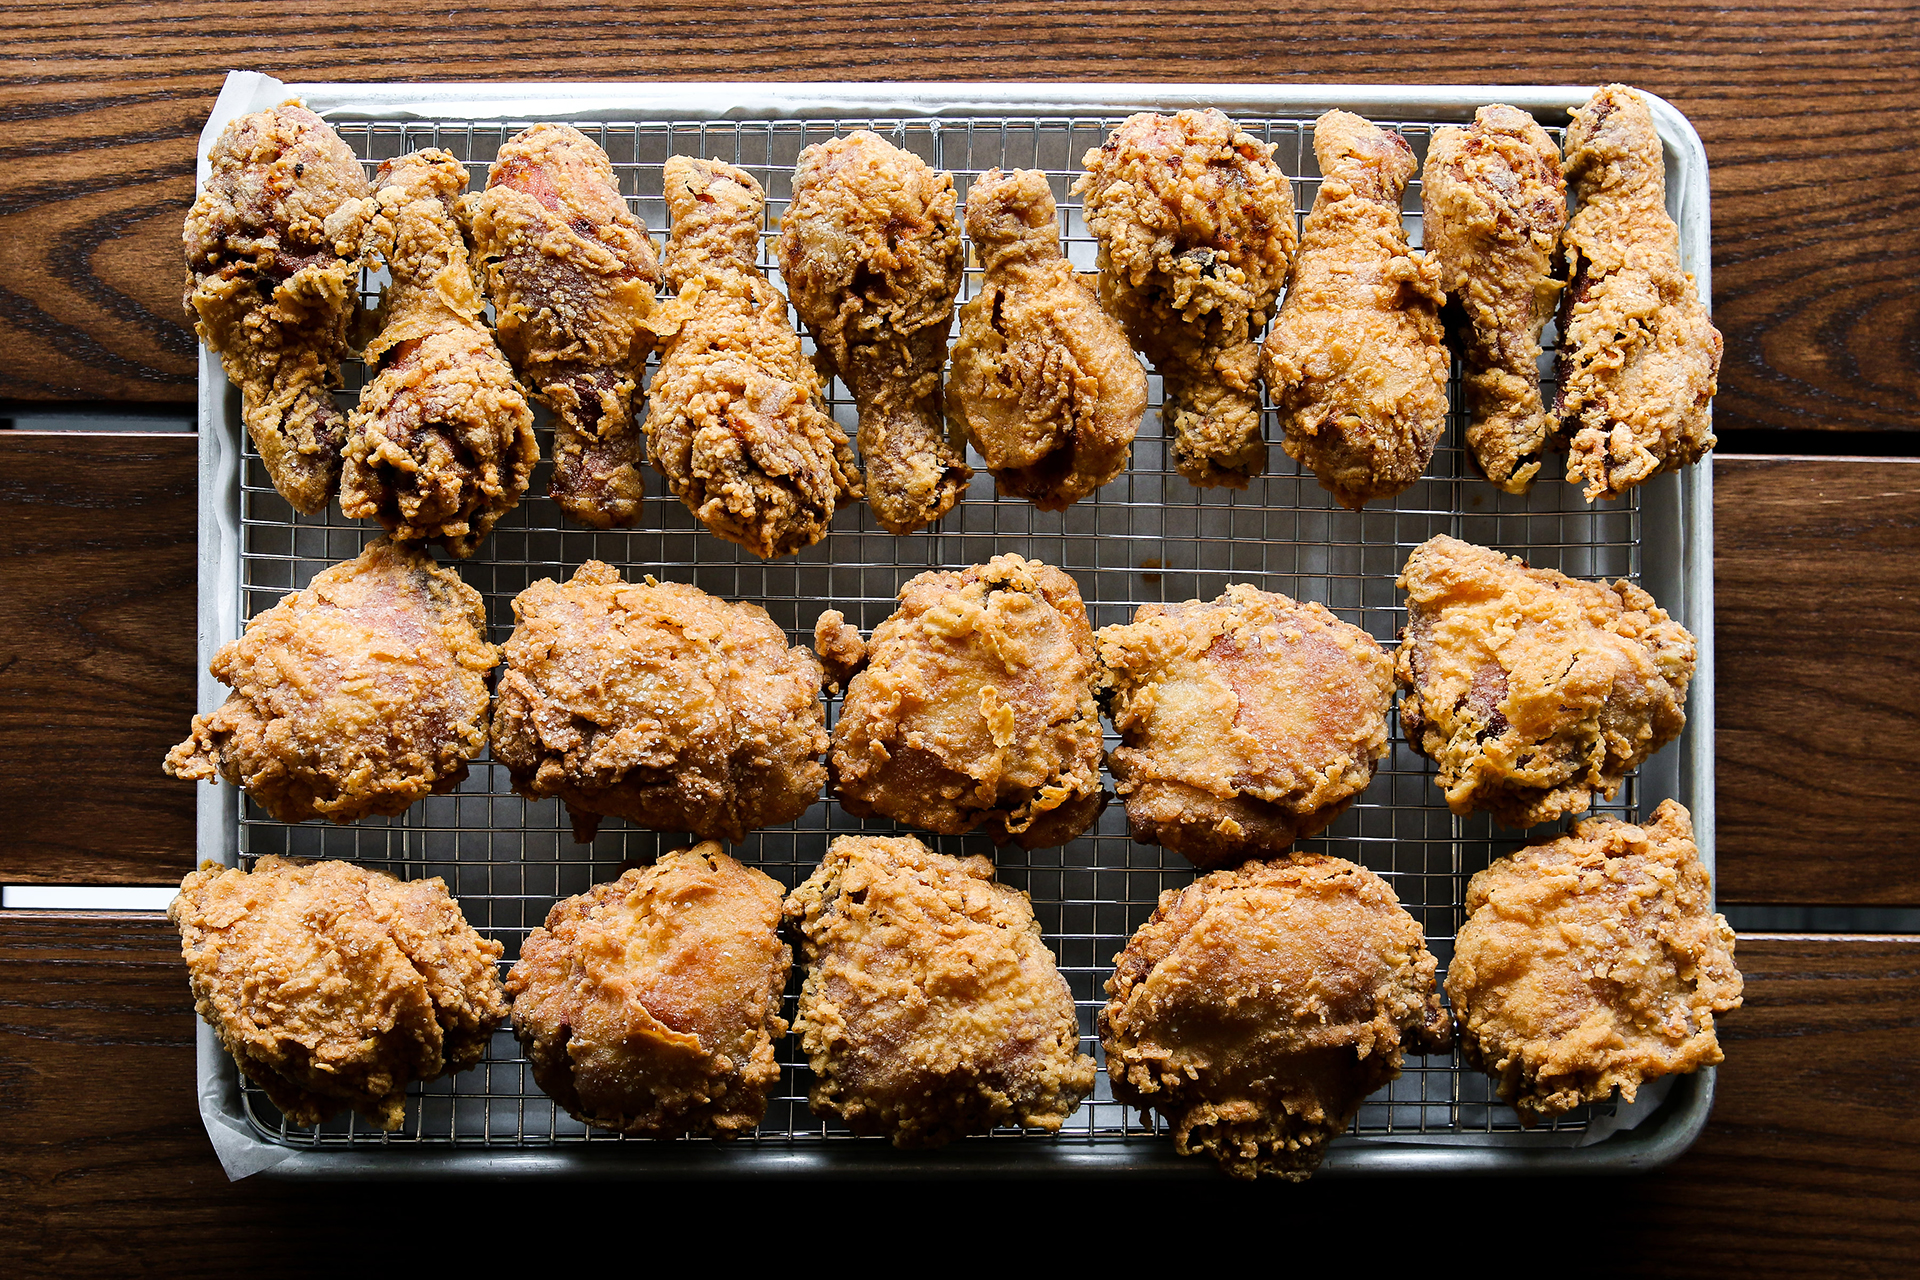 Juke's delicious trademark gluten-free, non-GMO-grain-fed and free-range fried chicken